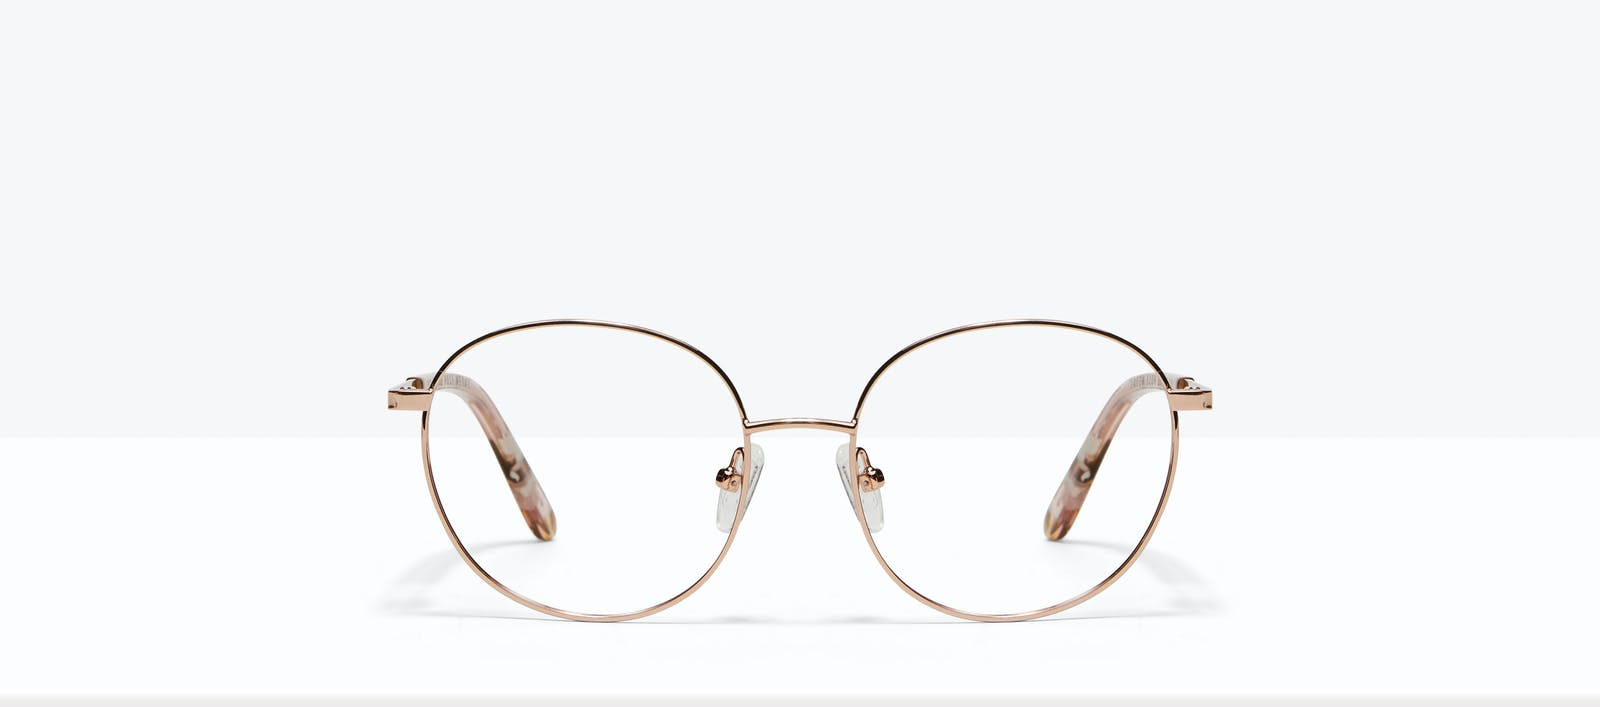 ffd2571bde7 Affordable Fashion Glasses Round Eyeglasses Women Joy Petite Rose Metal  Front